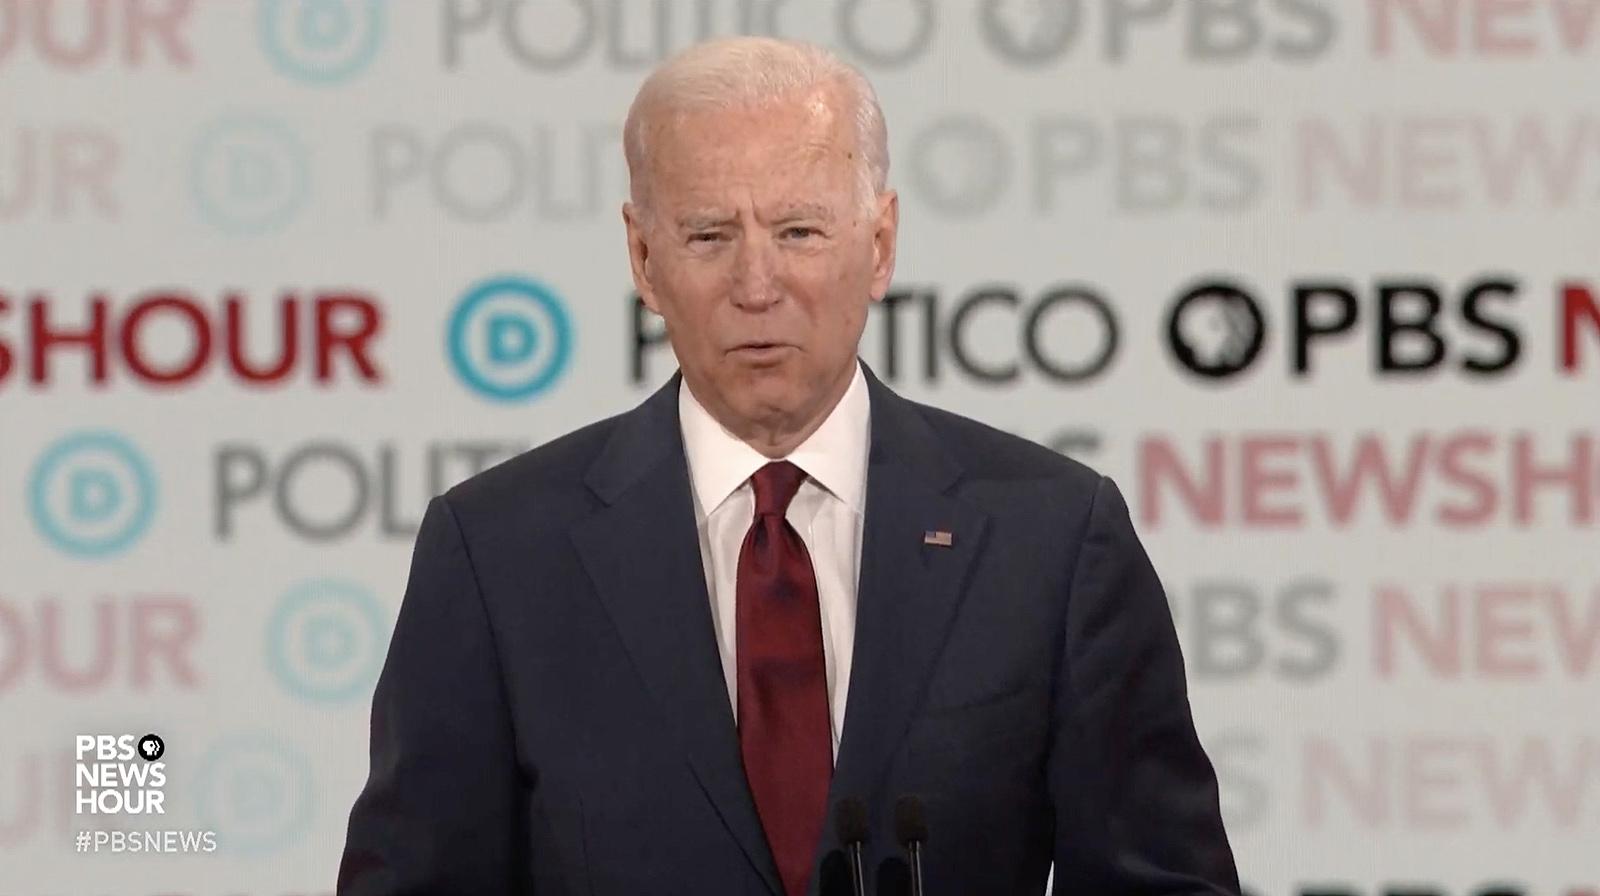 NCS_PBS-NewsHour_Politico_Democratic-Debate_011